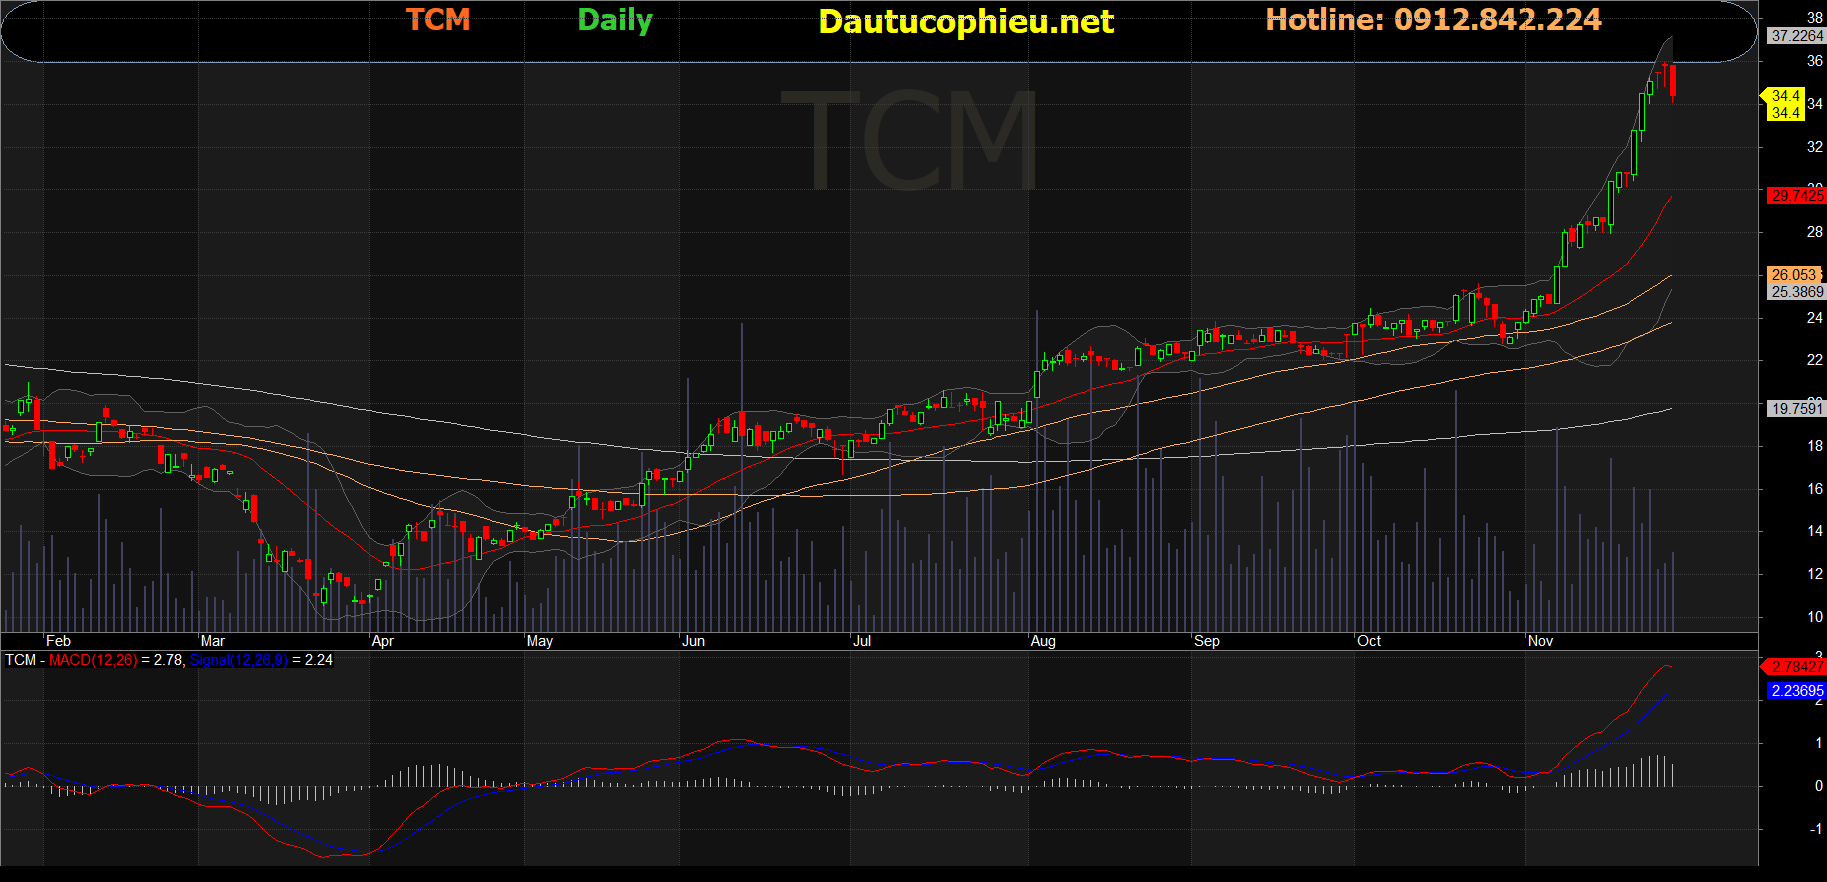 Cổ phiếu TCM